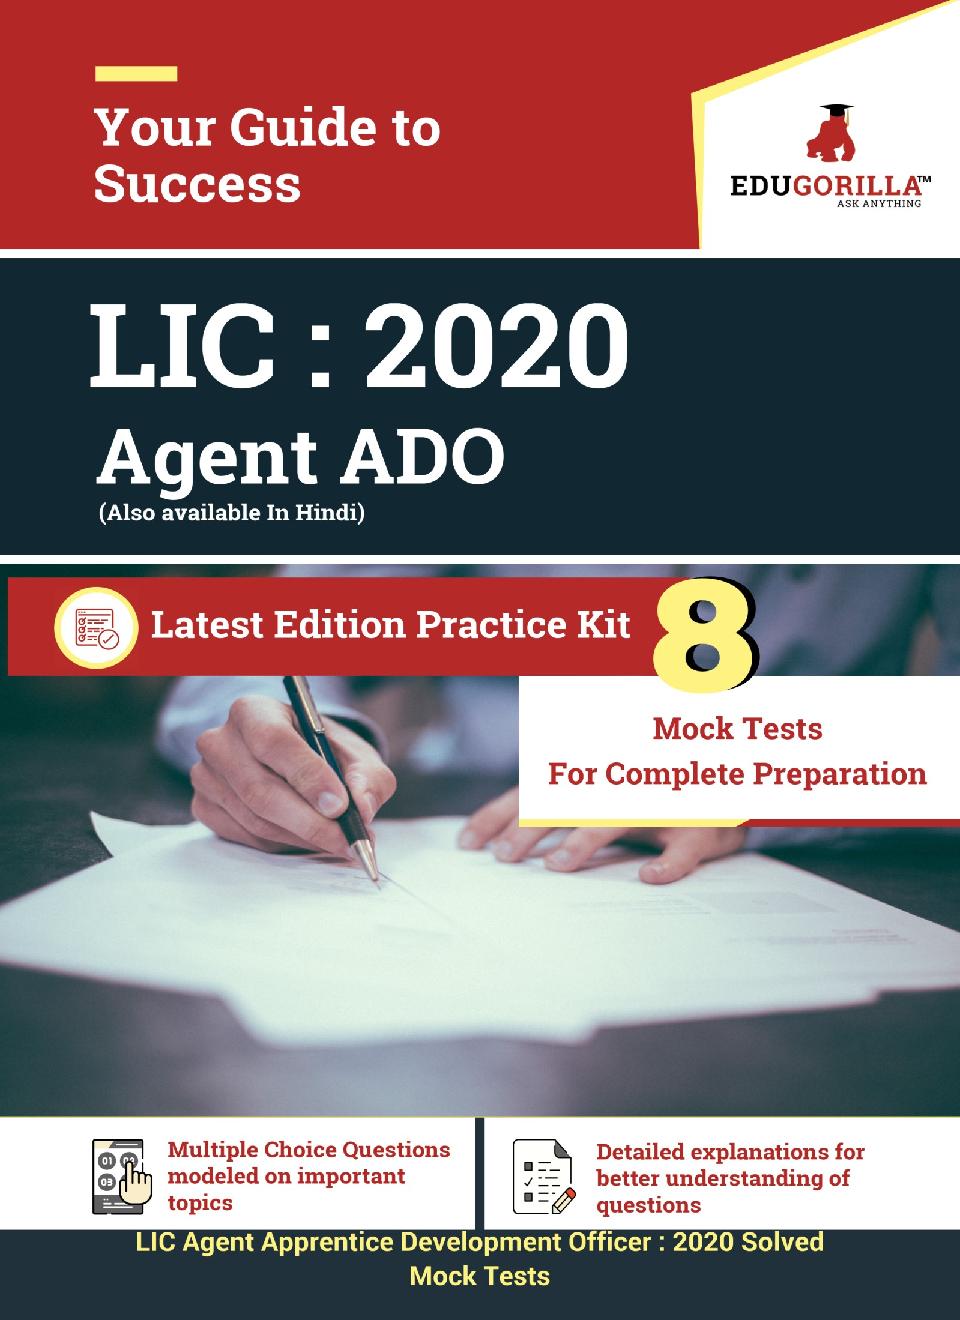 EduGorilla LIC Agent ADO 2020 - 8 Mock Tests -  Latest Edition Practice Kit - Page 1